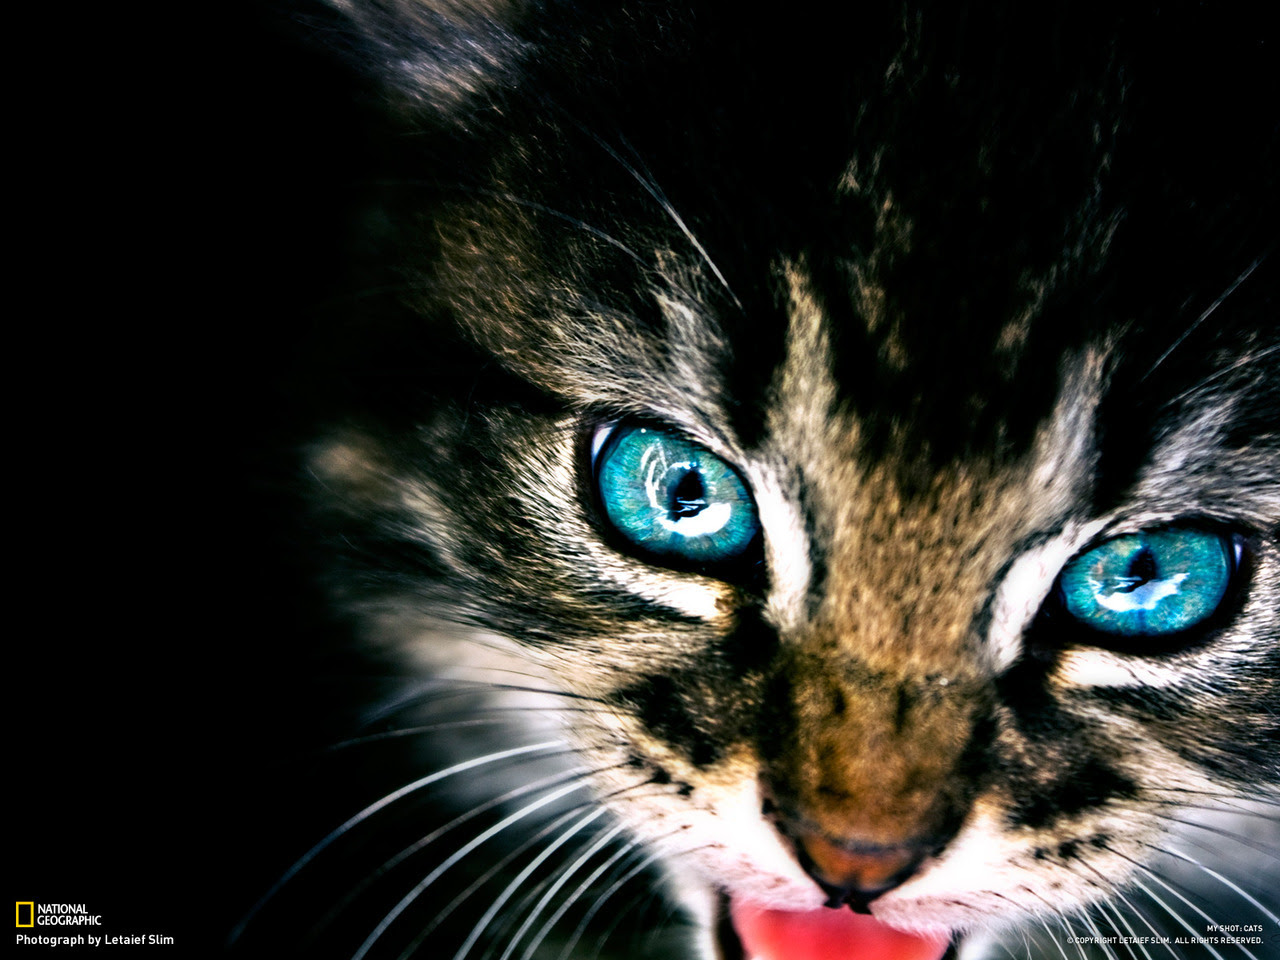 http://24.media.tumblr.com/tumblr_m8j99bRUFa1r388myo1_1280.jpg